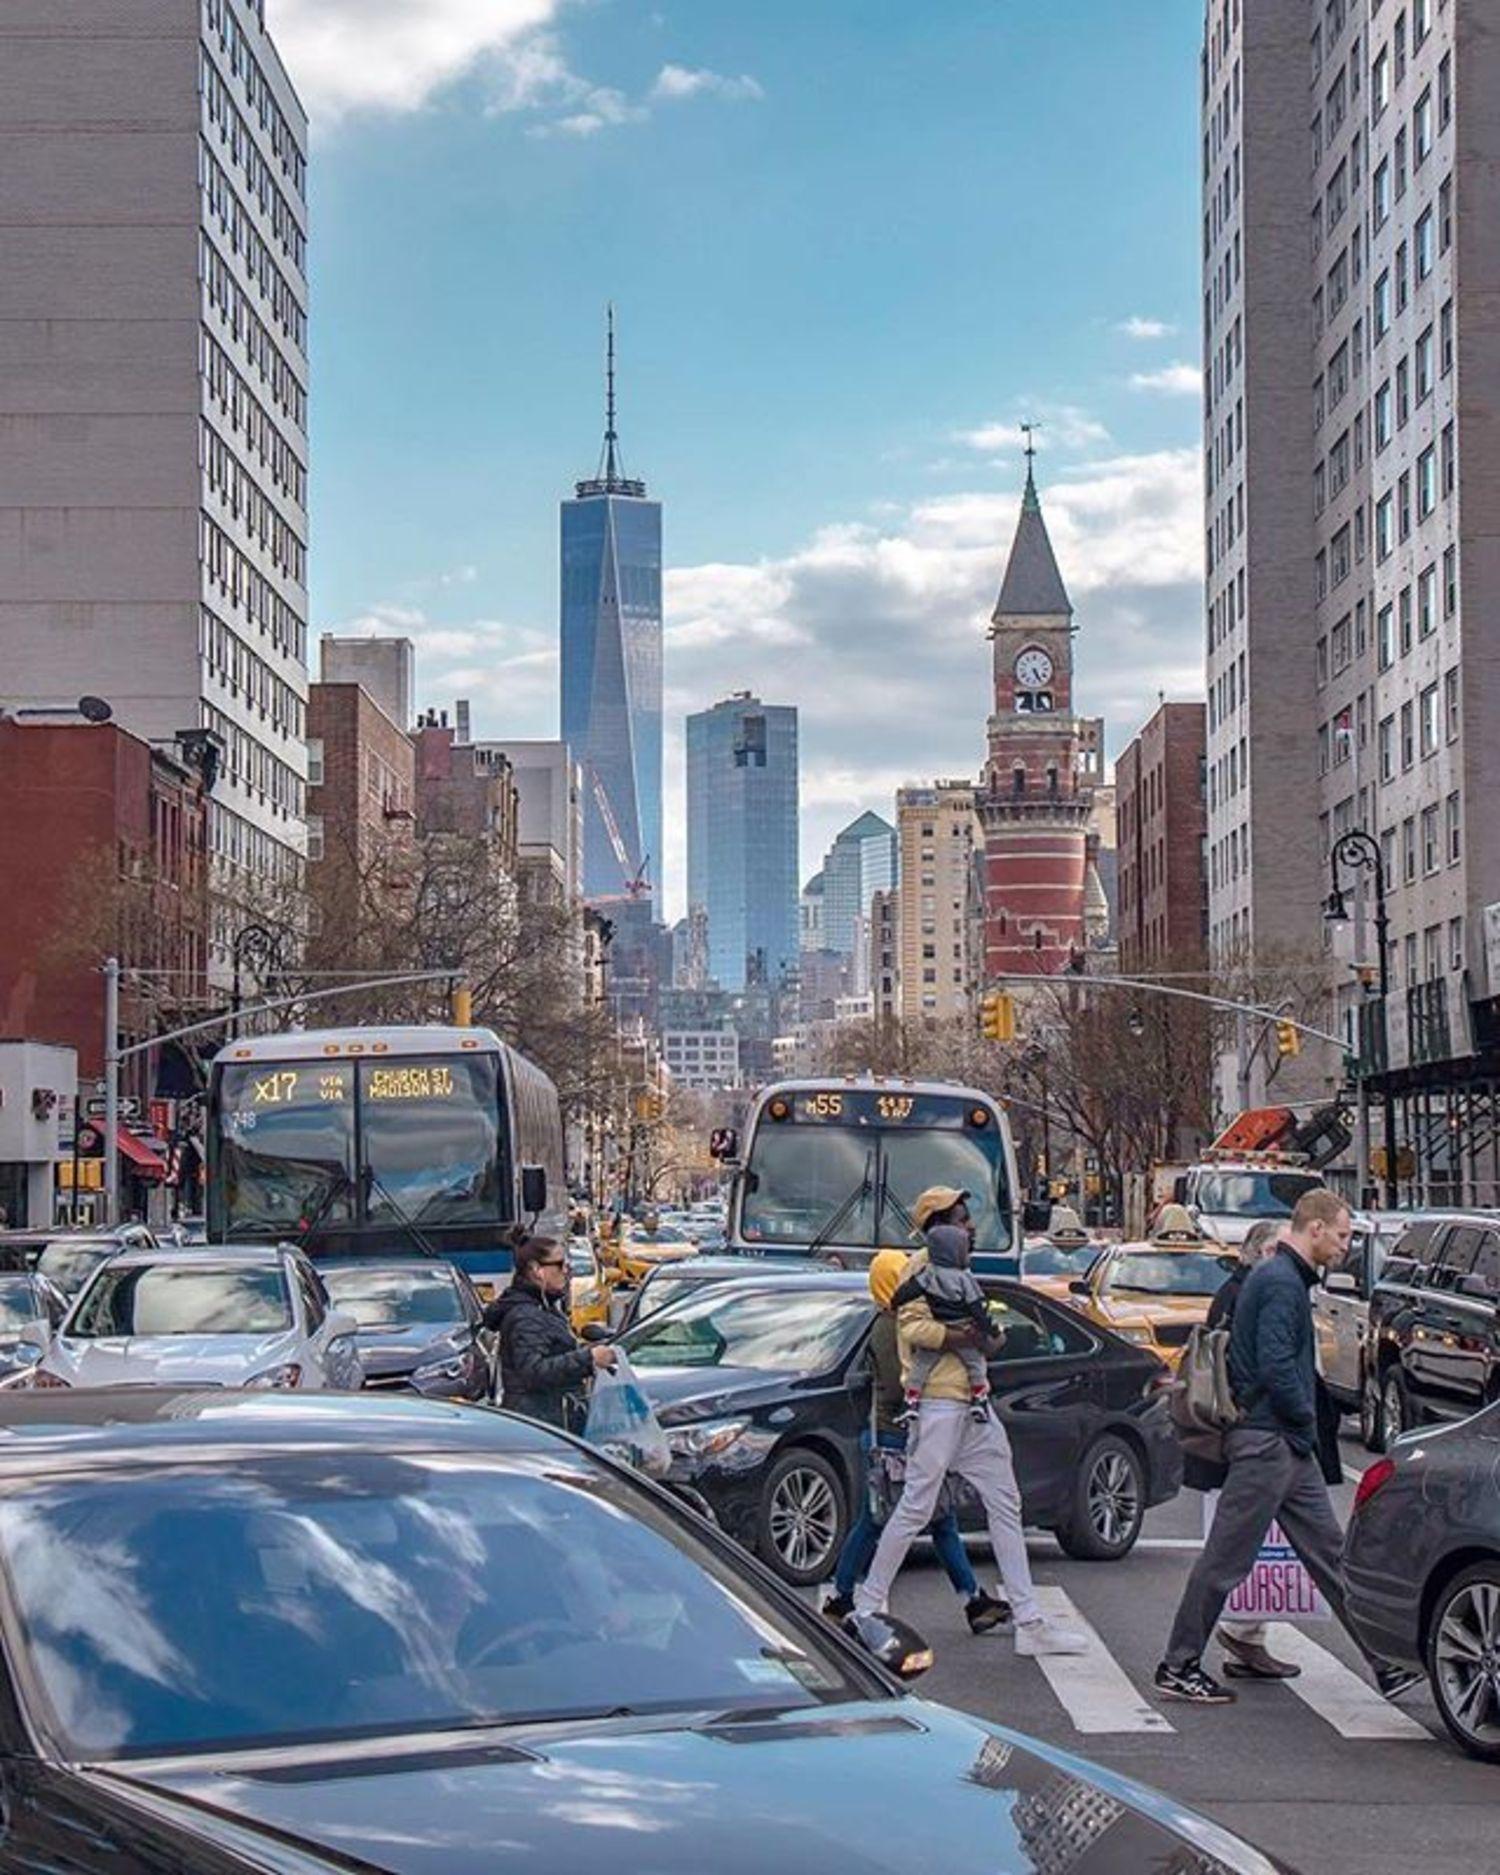 6th Avenue, Manhattan. Photo via @newyorkcitykopp #viewingnyc #newyorkcity #newyork #nyc